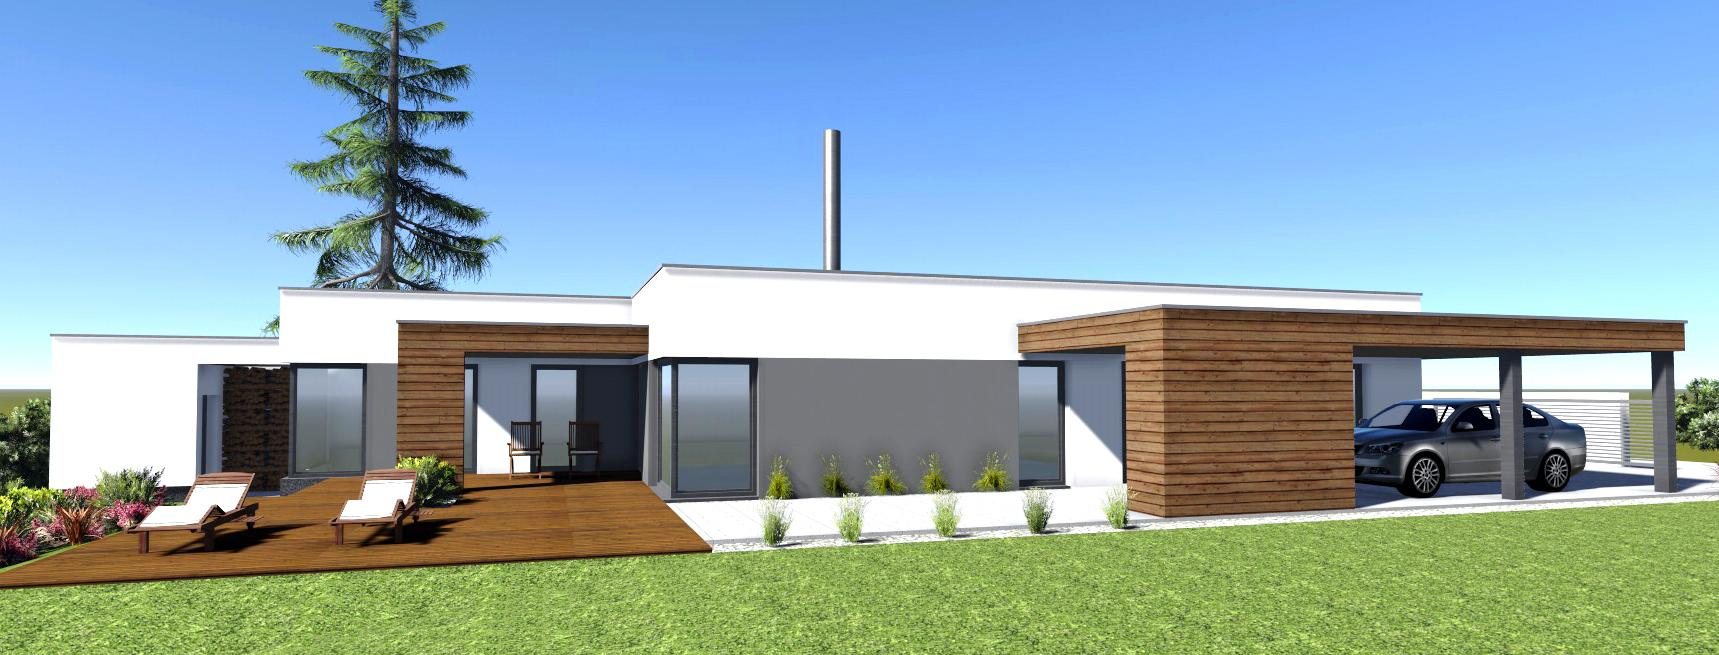 Dom - Obrázok č. 111